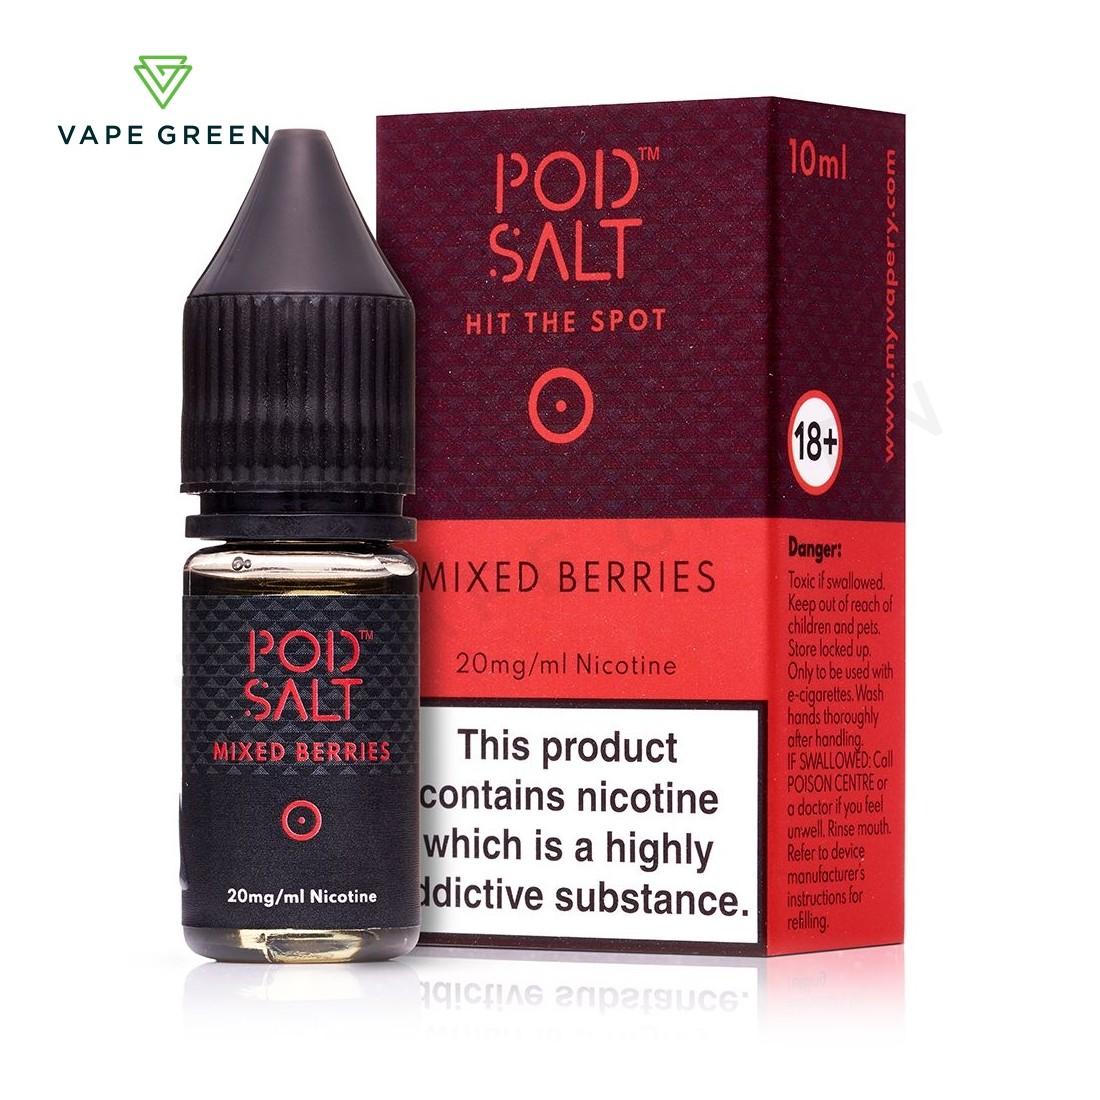 Mixed Berries eLiquid by Pod Salt